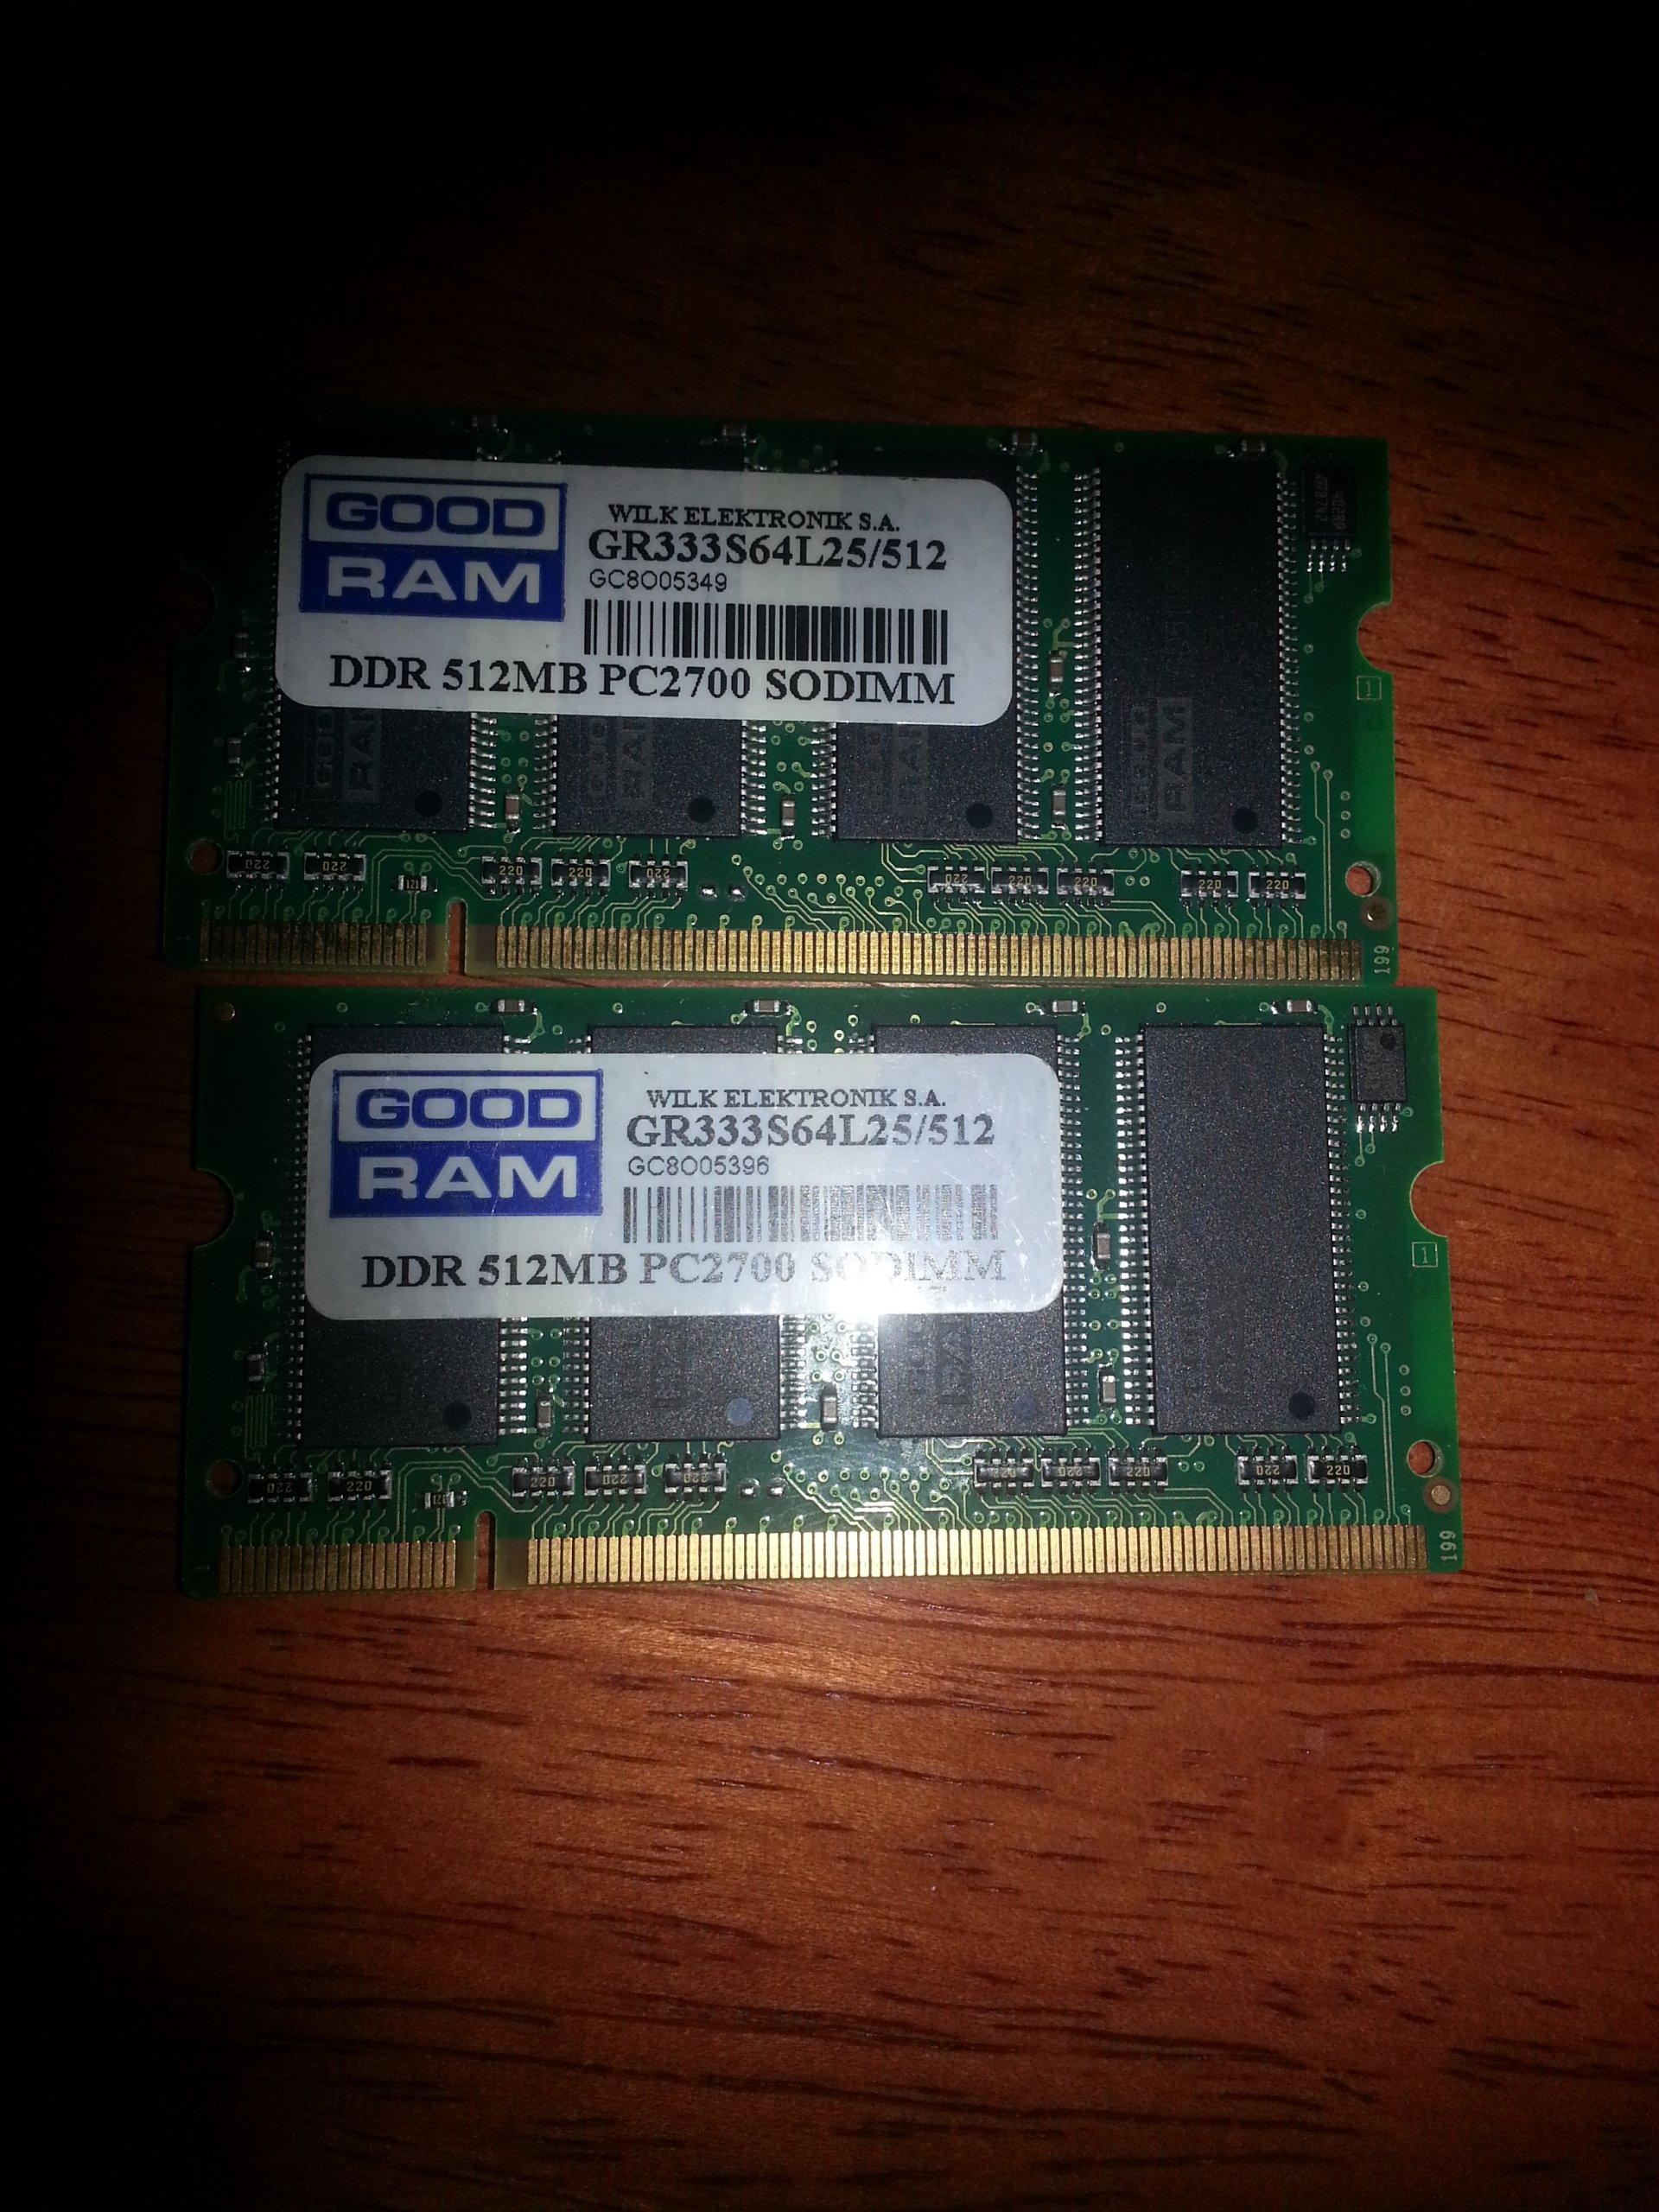 GOOD RAM DDR 512MB PC2700 SODIMM